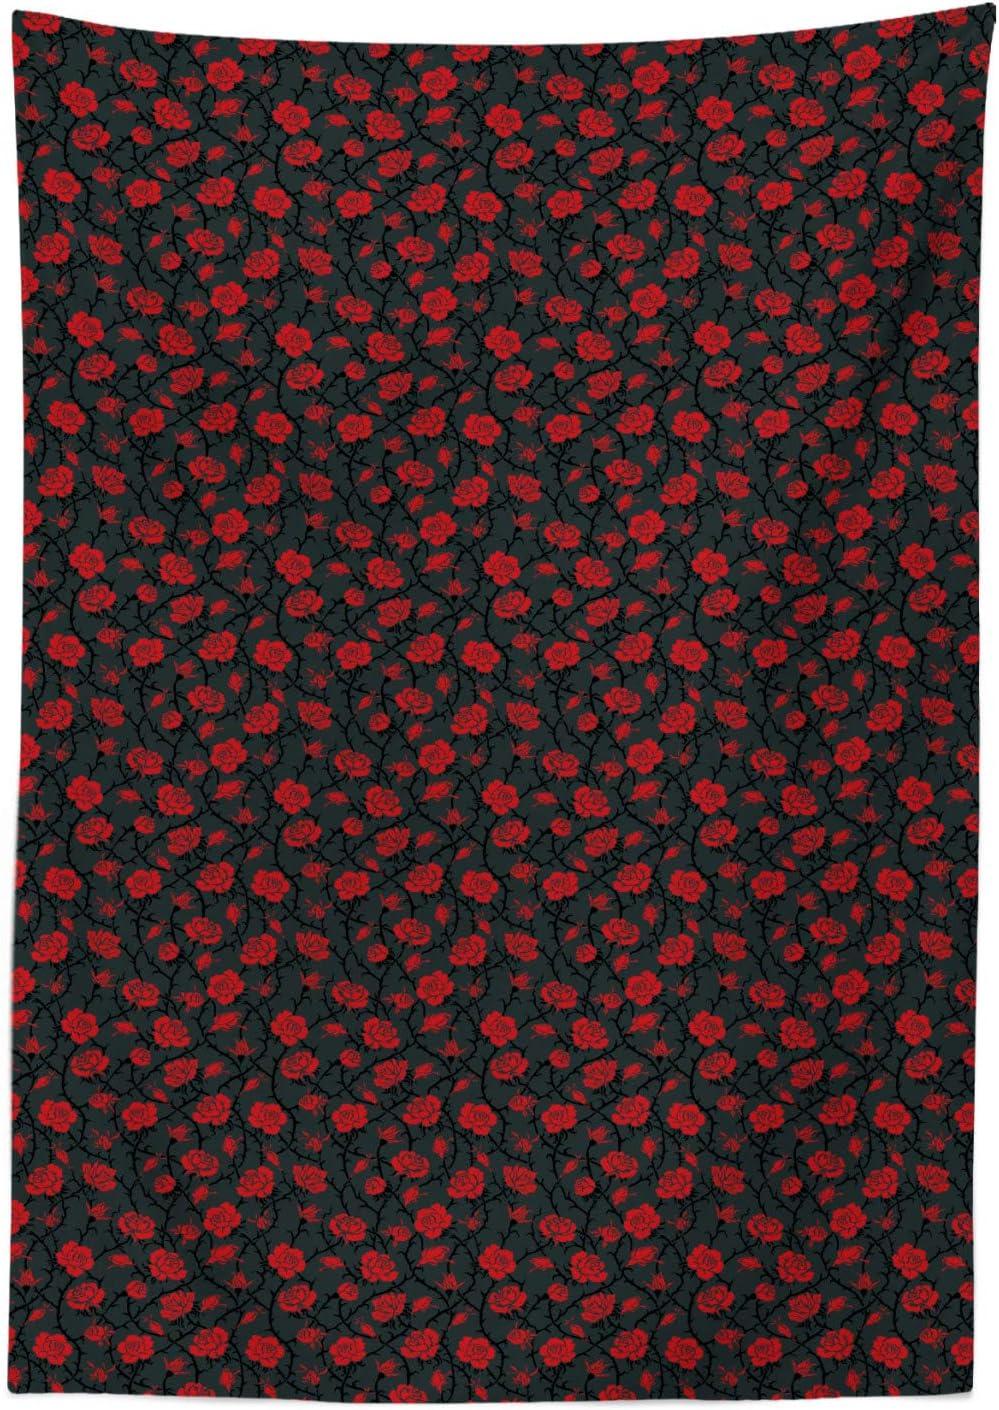 Azul Rojo Verde ABAKUHAUS Mariquitas Mantele Resistente al Agua Lavable Colores No Desti/ñen Personalizado 140 x 170 cm Fresa Retro Daisy